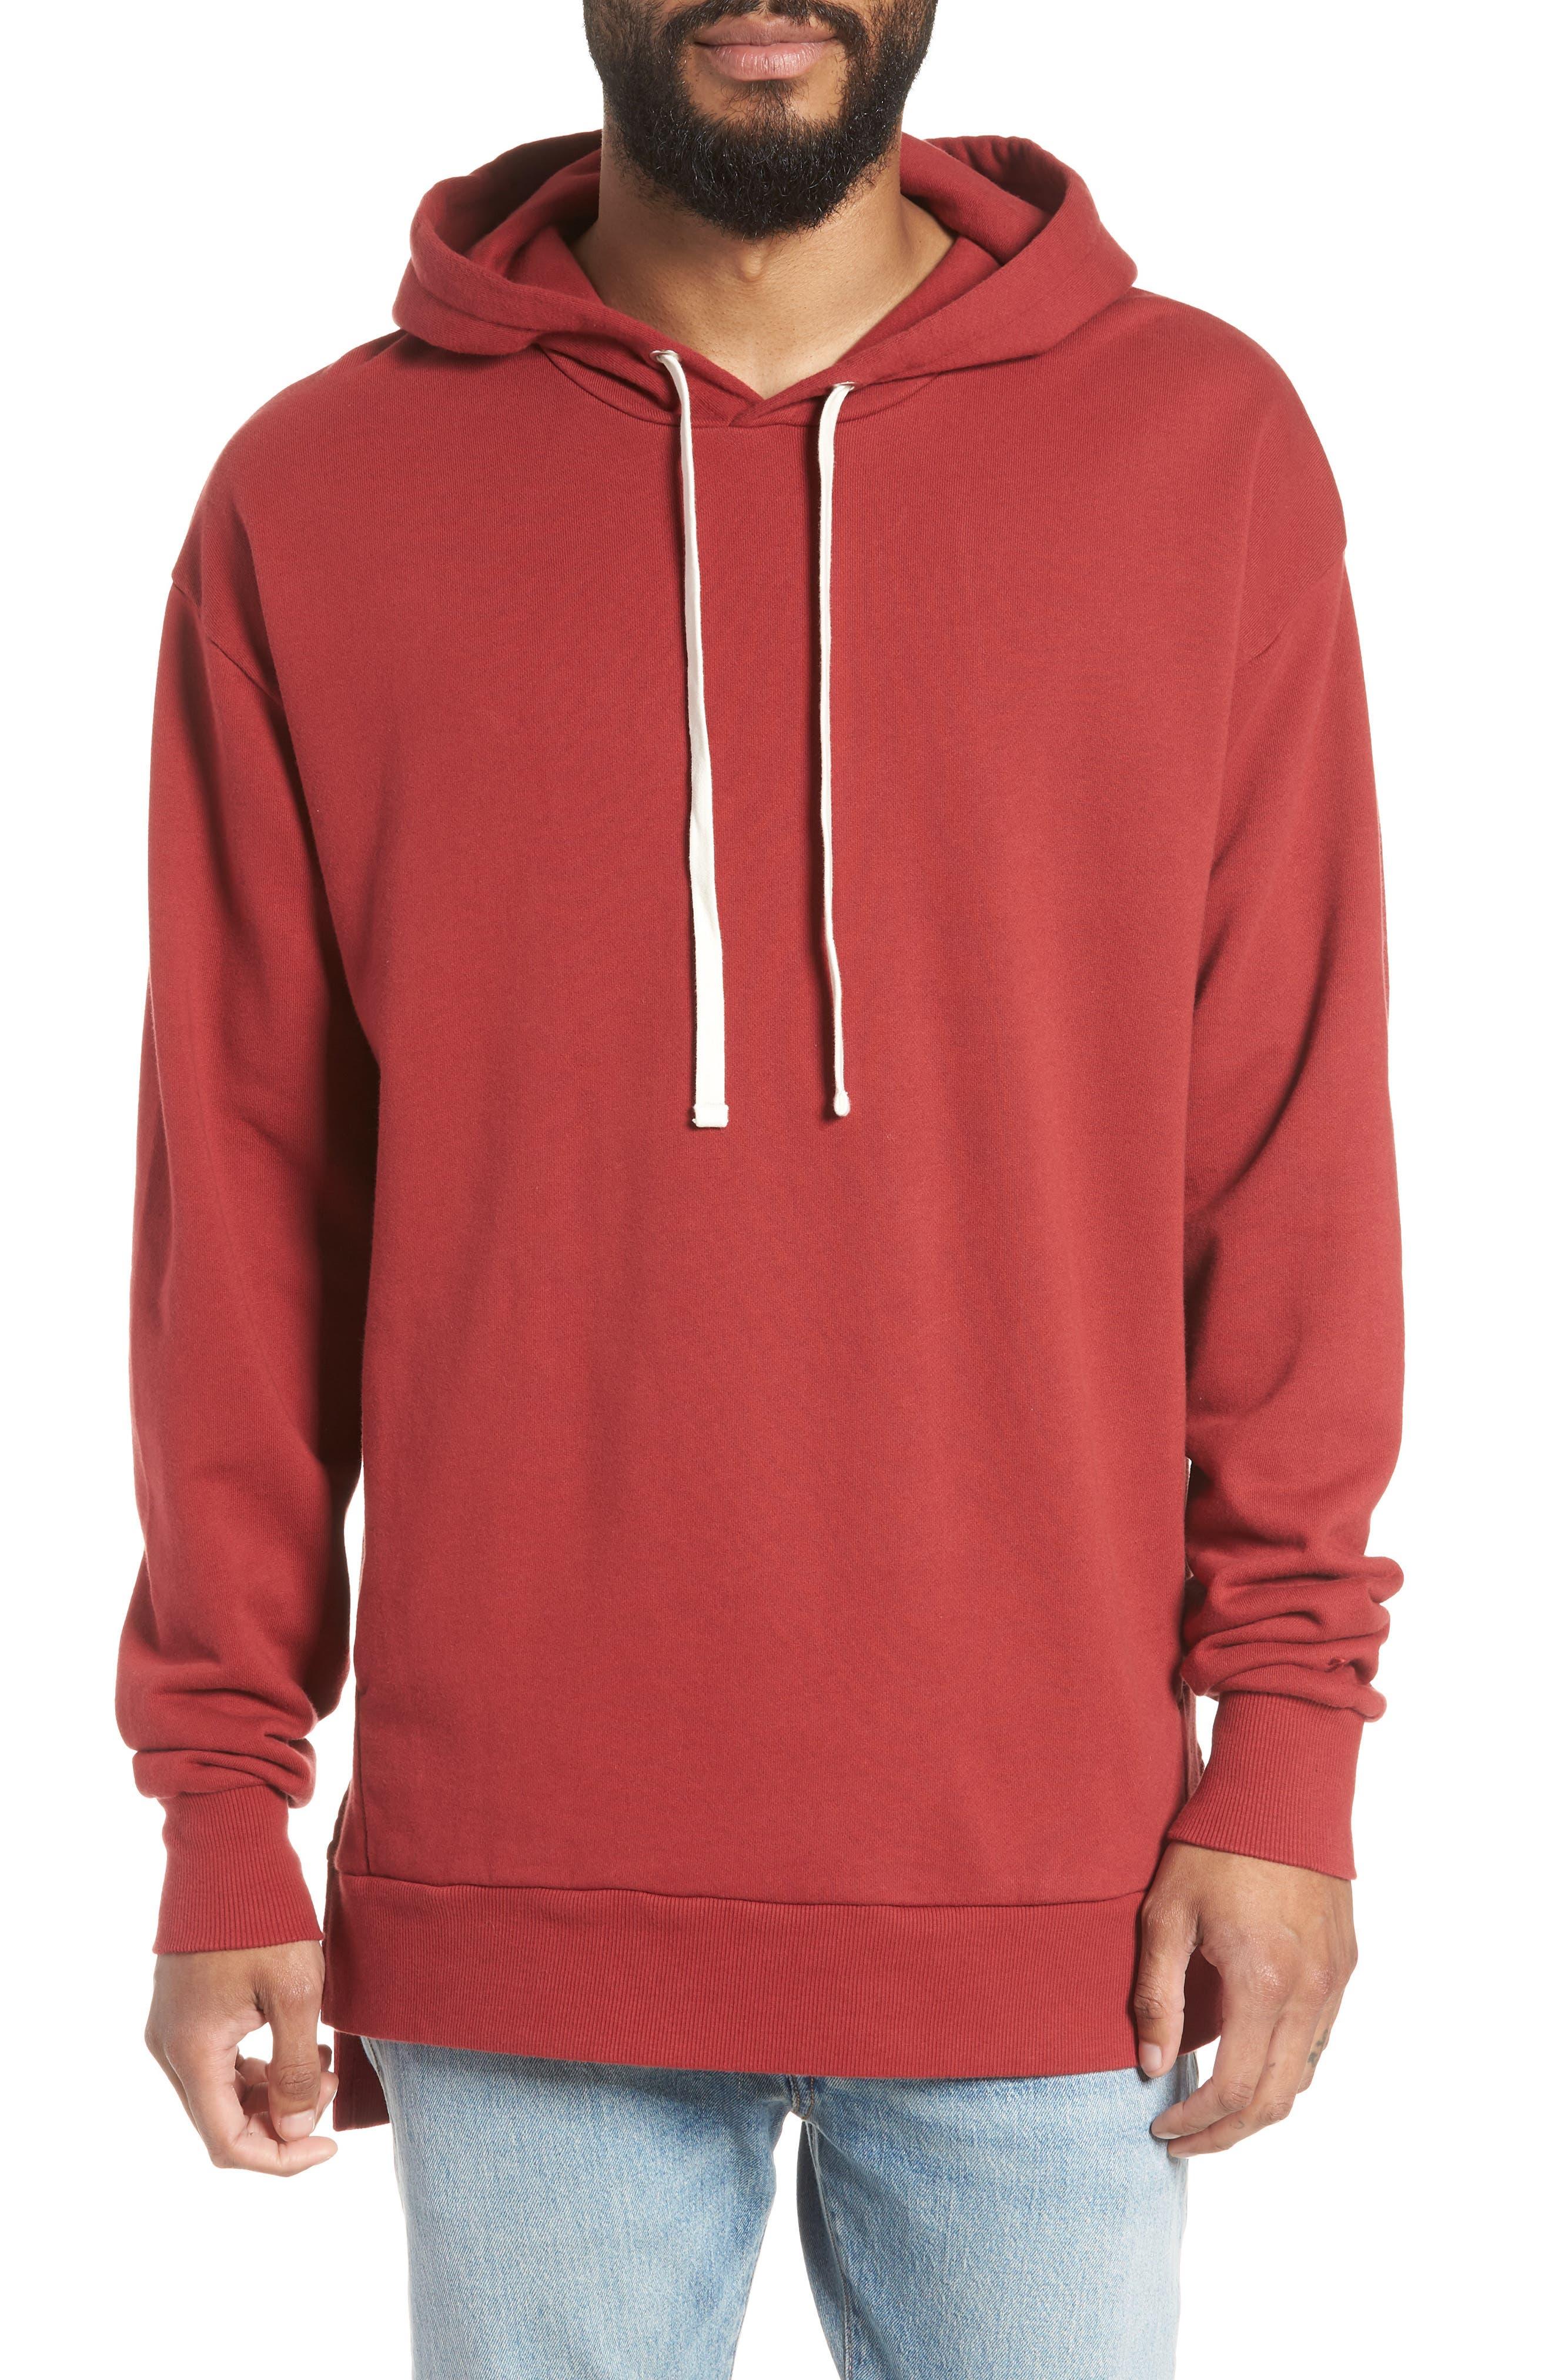 Rugger Hooded Sweatshirt,                             Main thumbnail 1, color,                             Dark Cherry